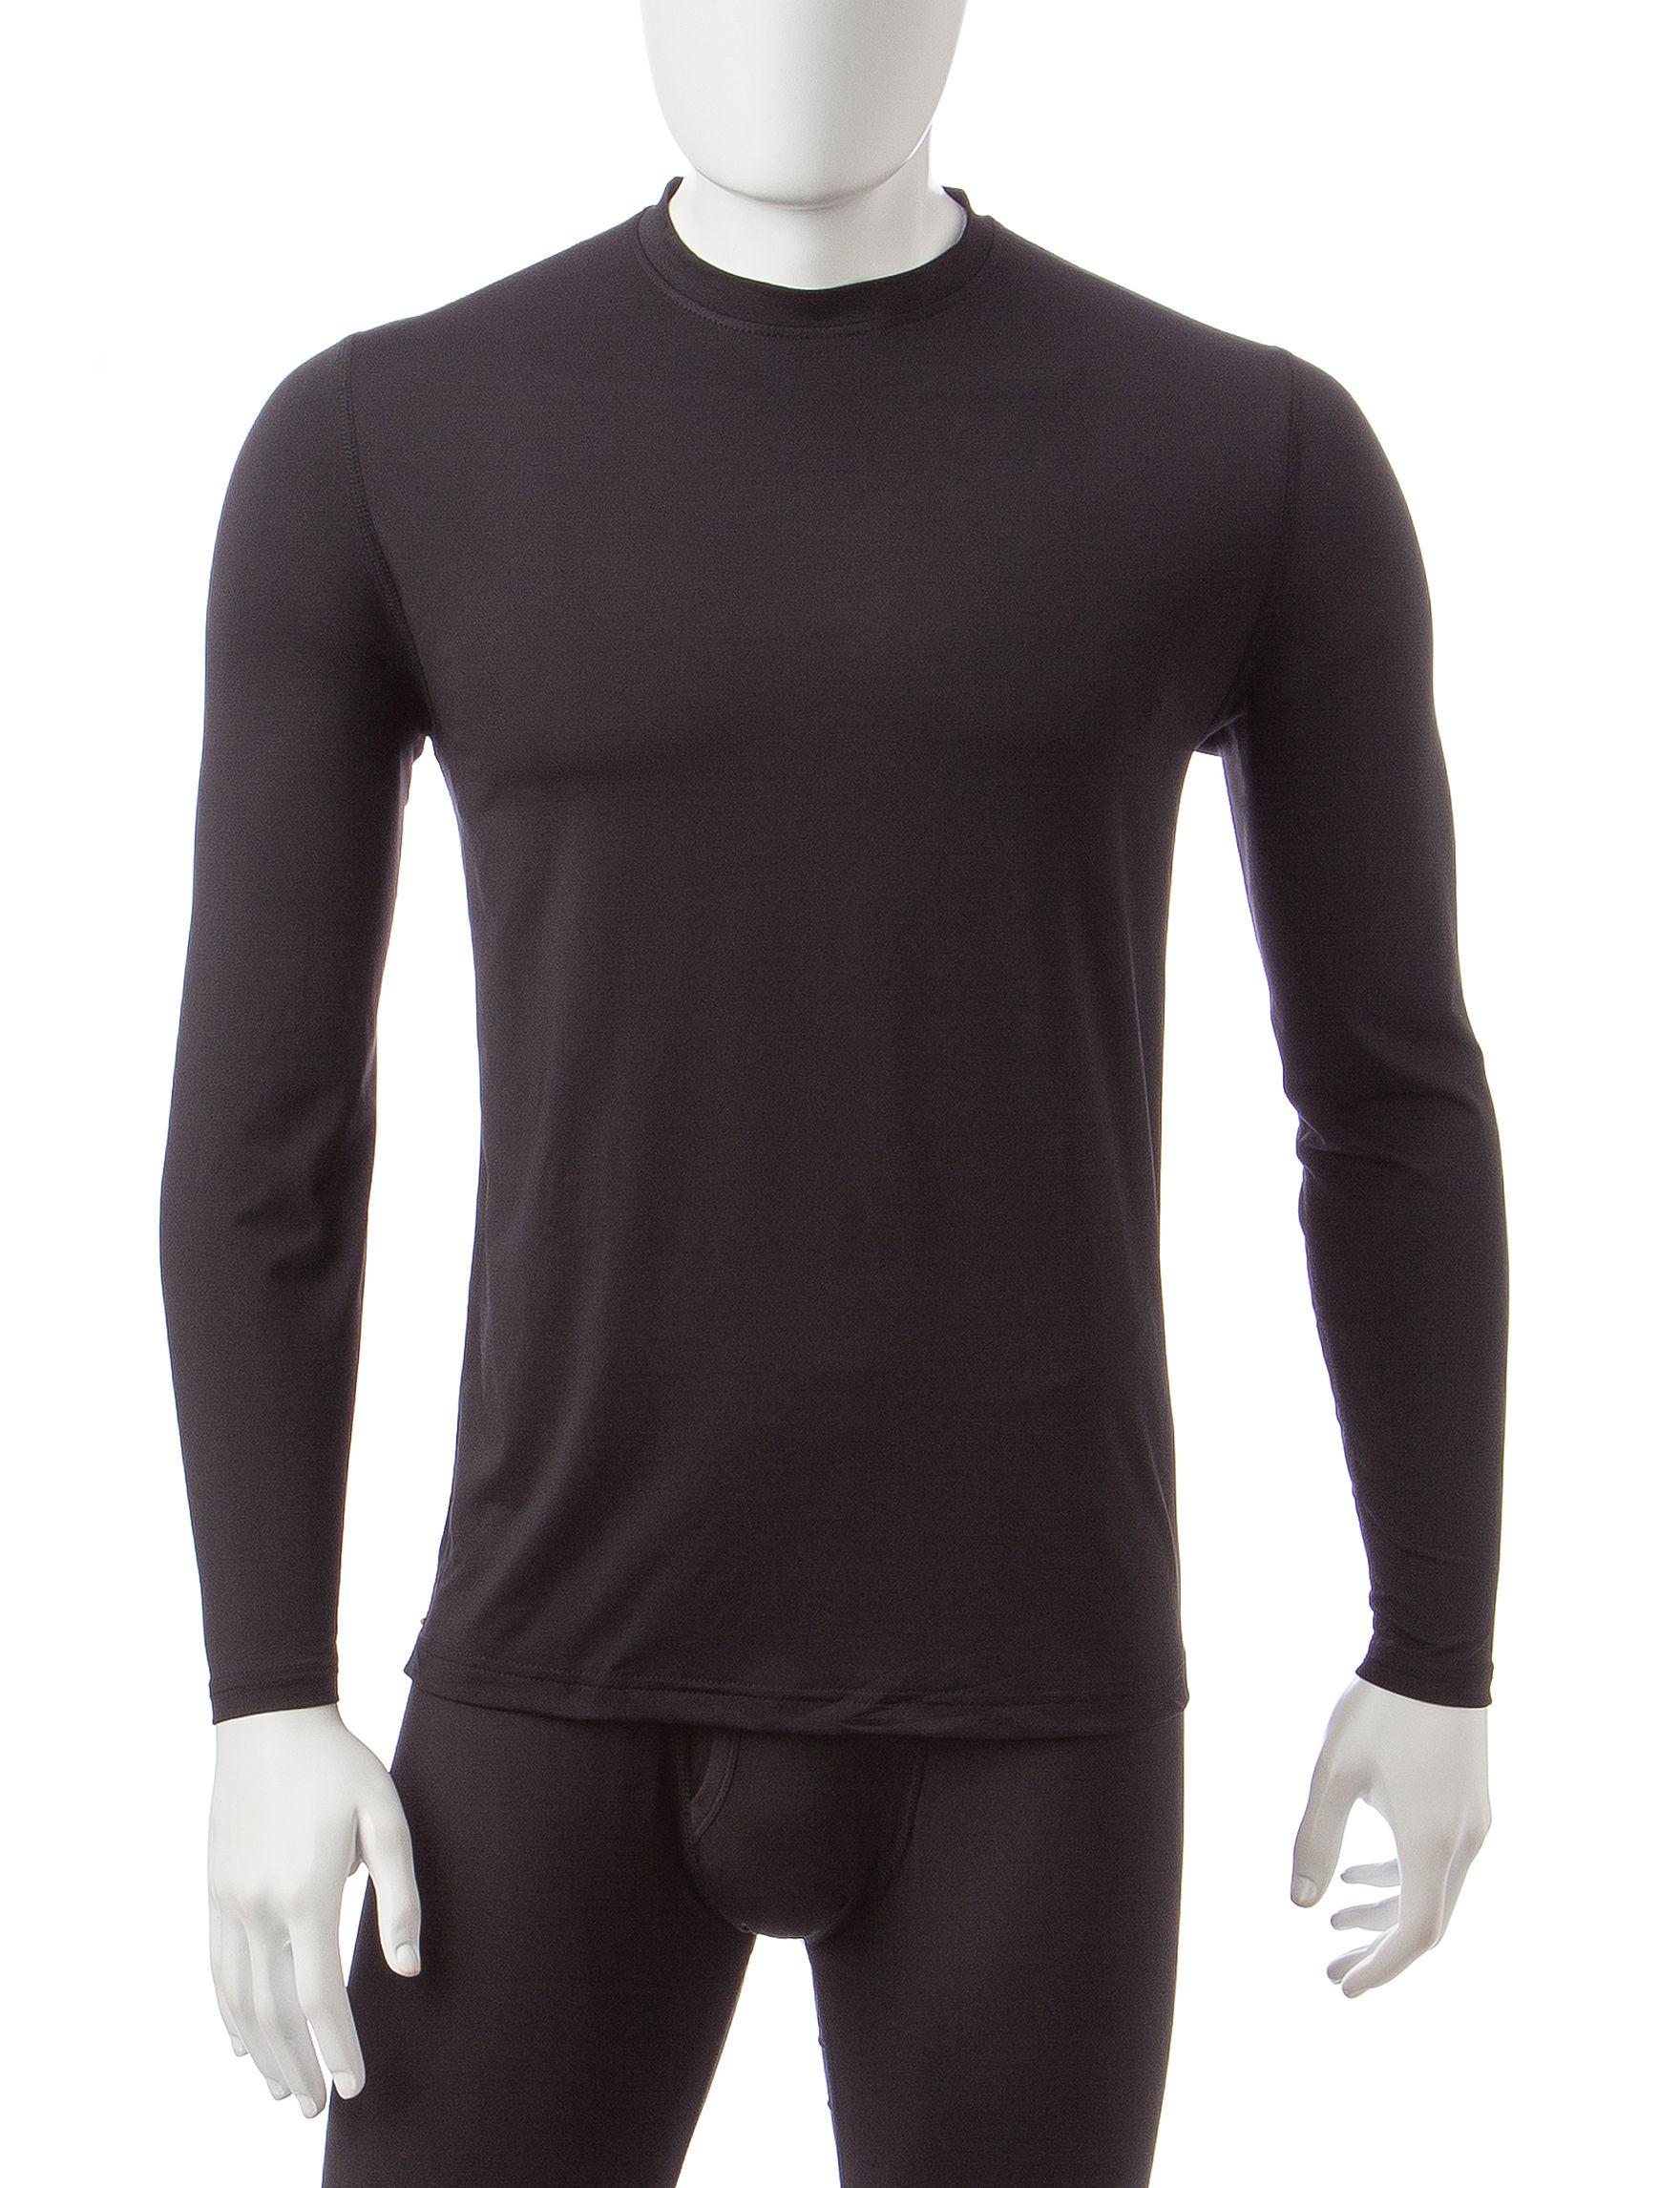 Weatherproof Black Undershirts